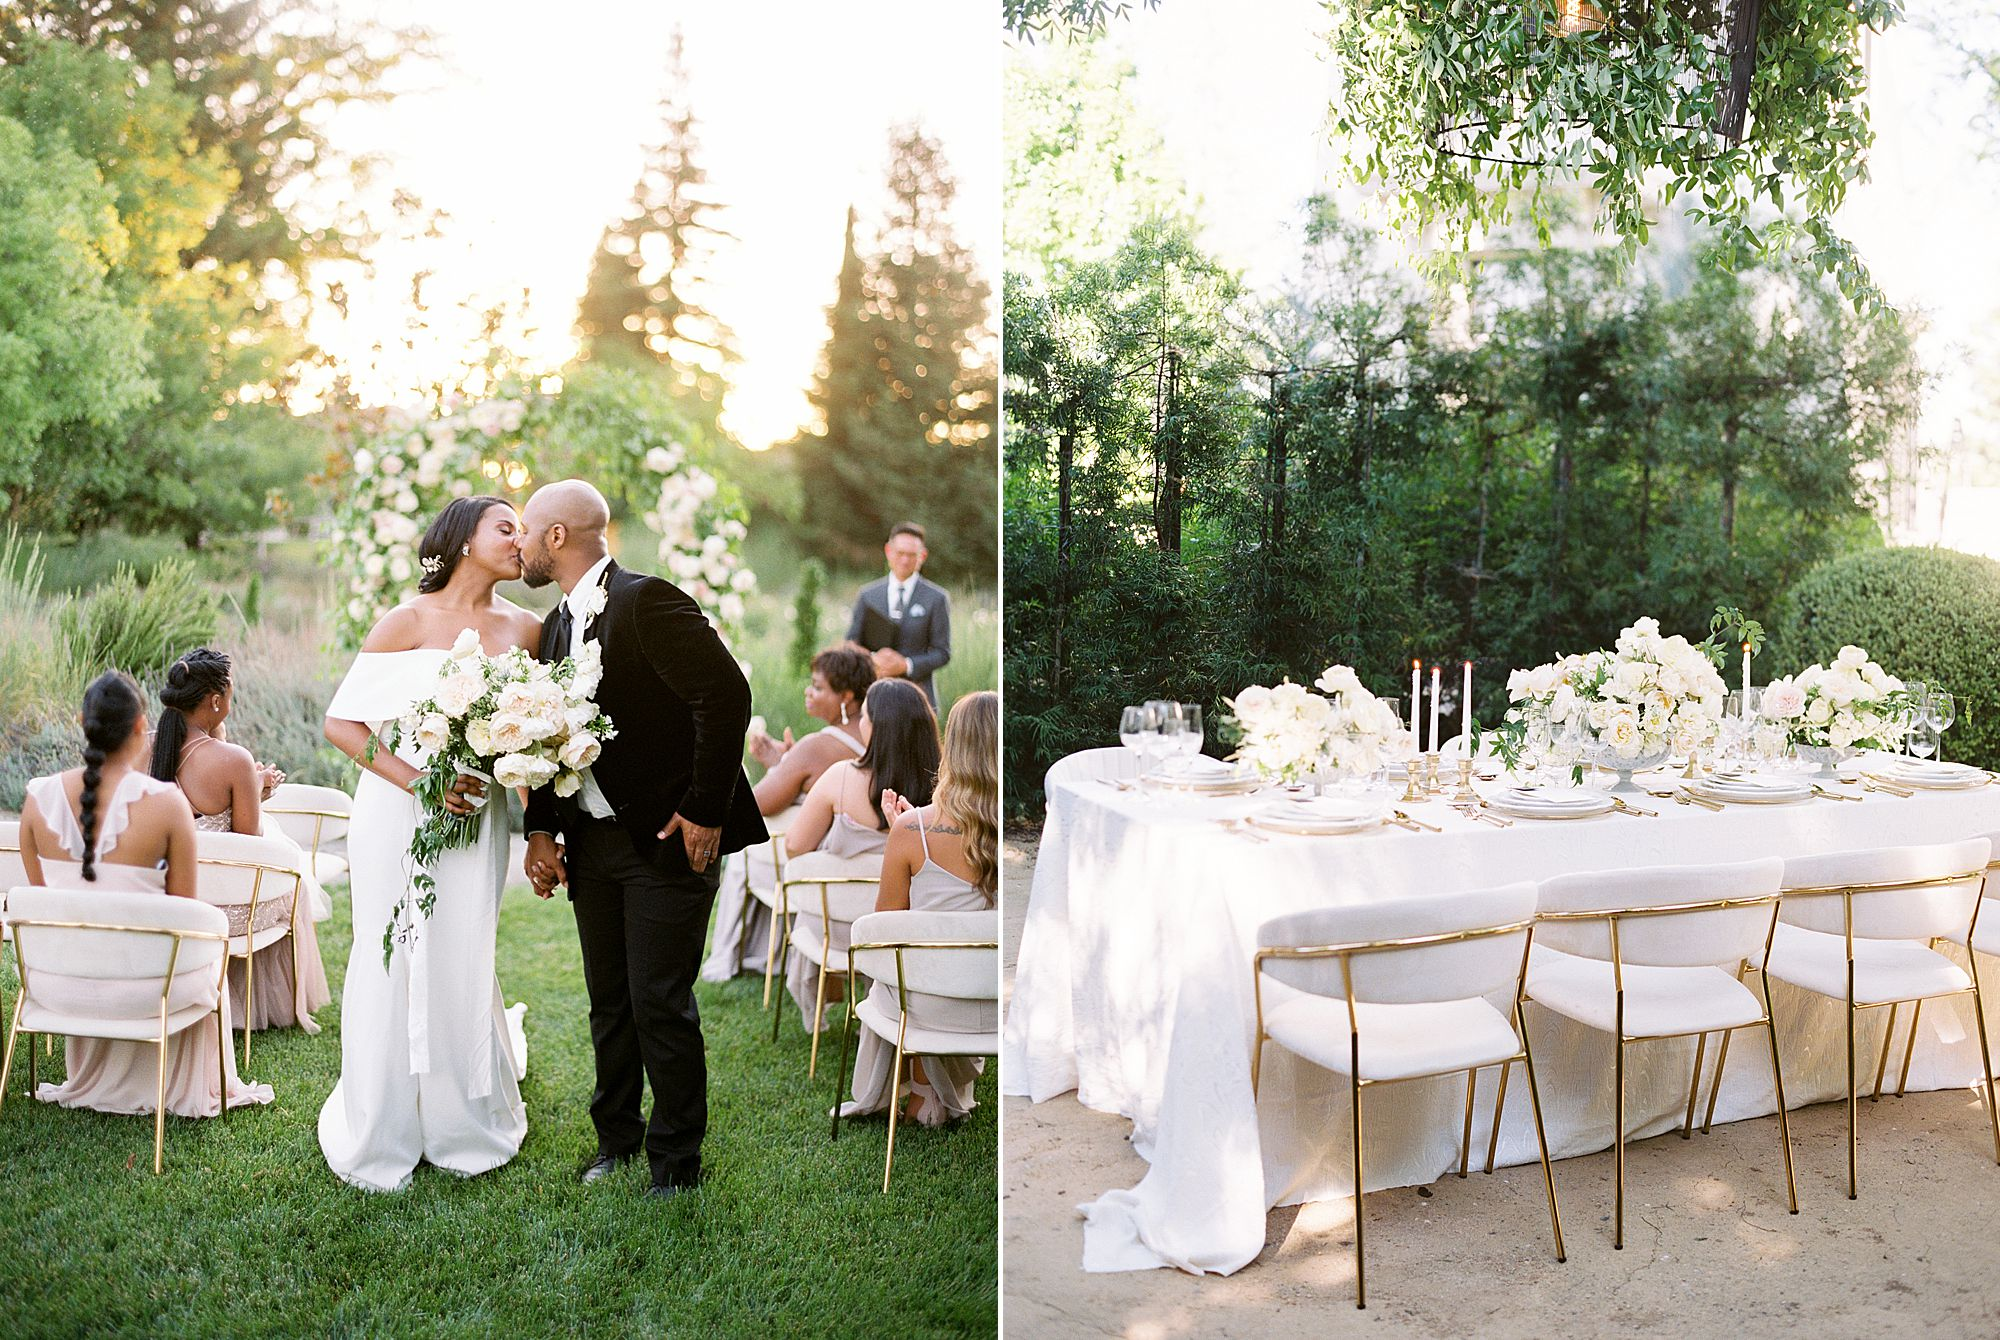 Park Winters Micro-Wedding Inspiration on Style Me Pretty - Stephanie Teague Events - Ashley Baumgartner - Park Winters Wedding - Black Tie Wedding - Micro-Wedding Sacramento Photographer_0015.jpg